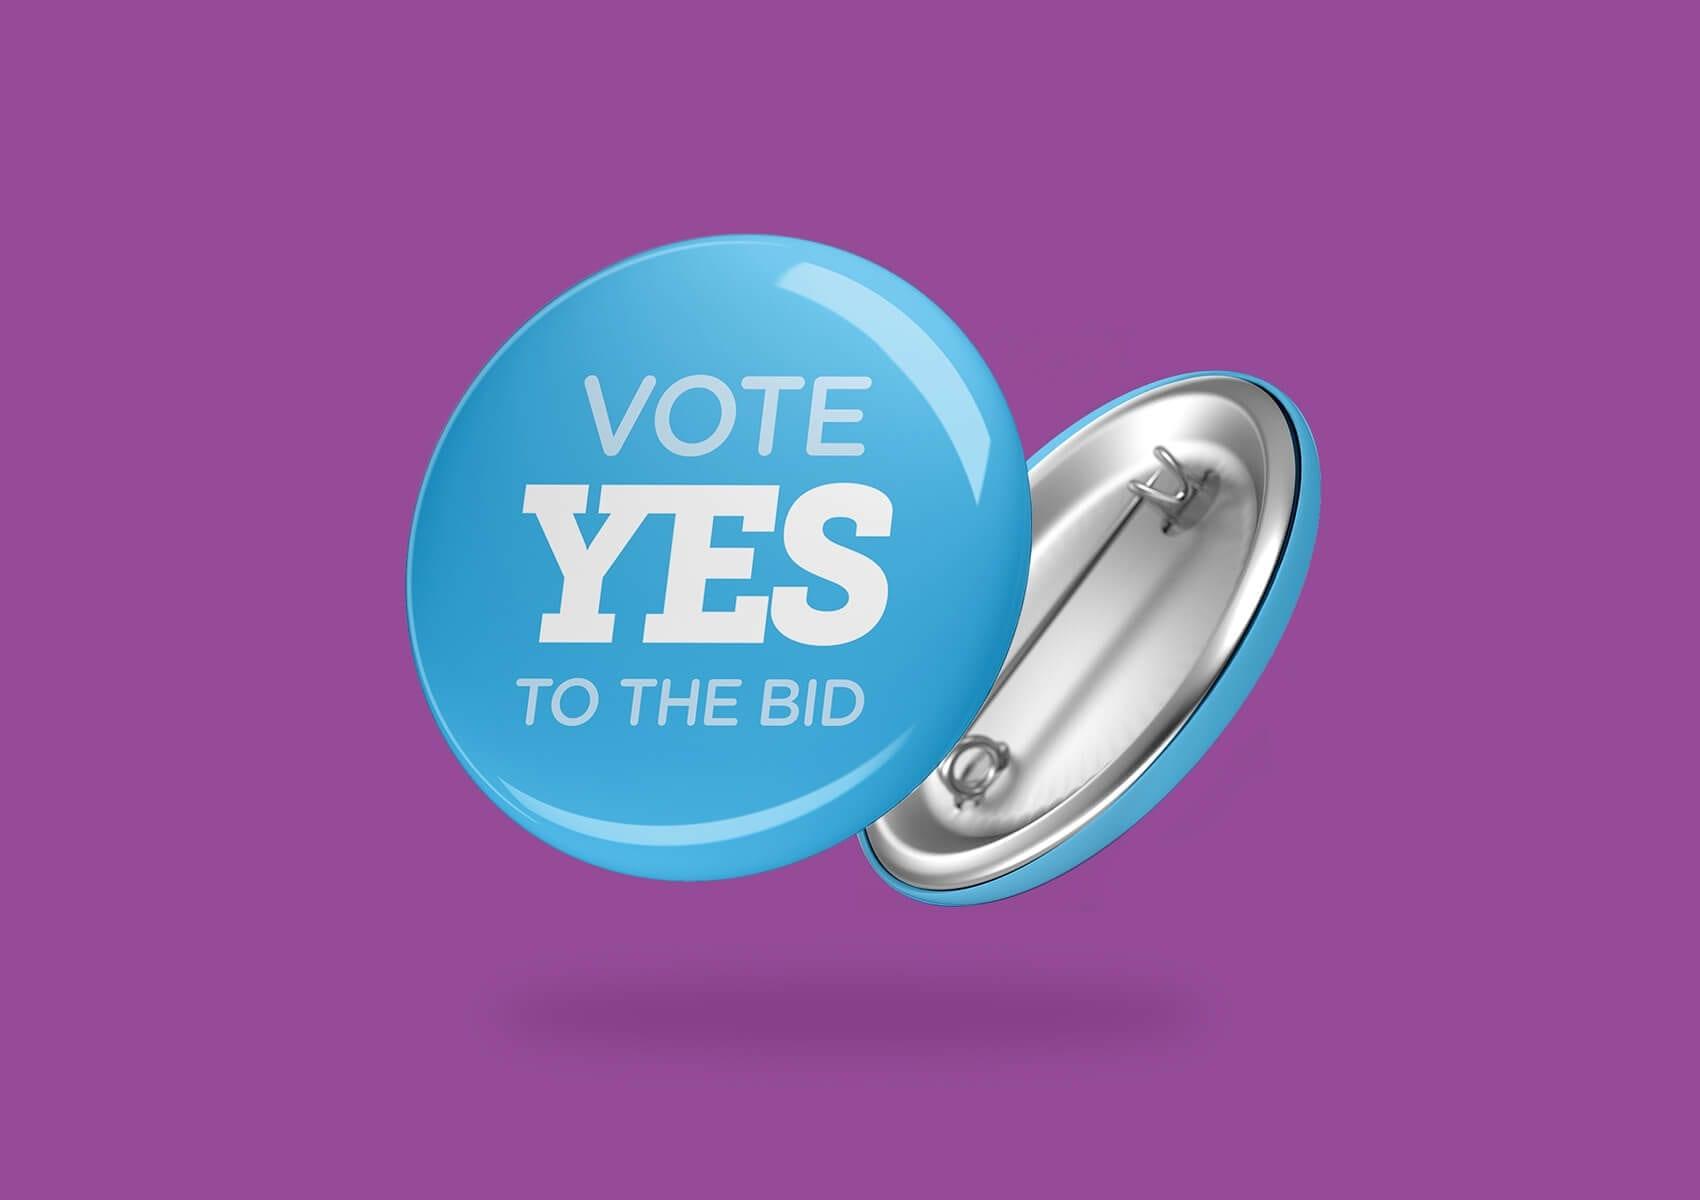 Yes vote badge